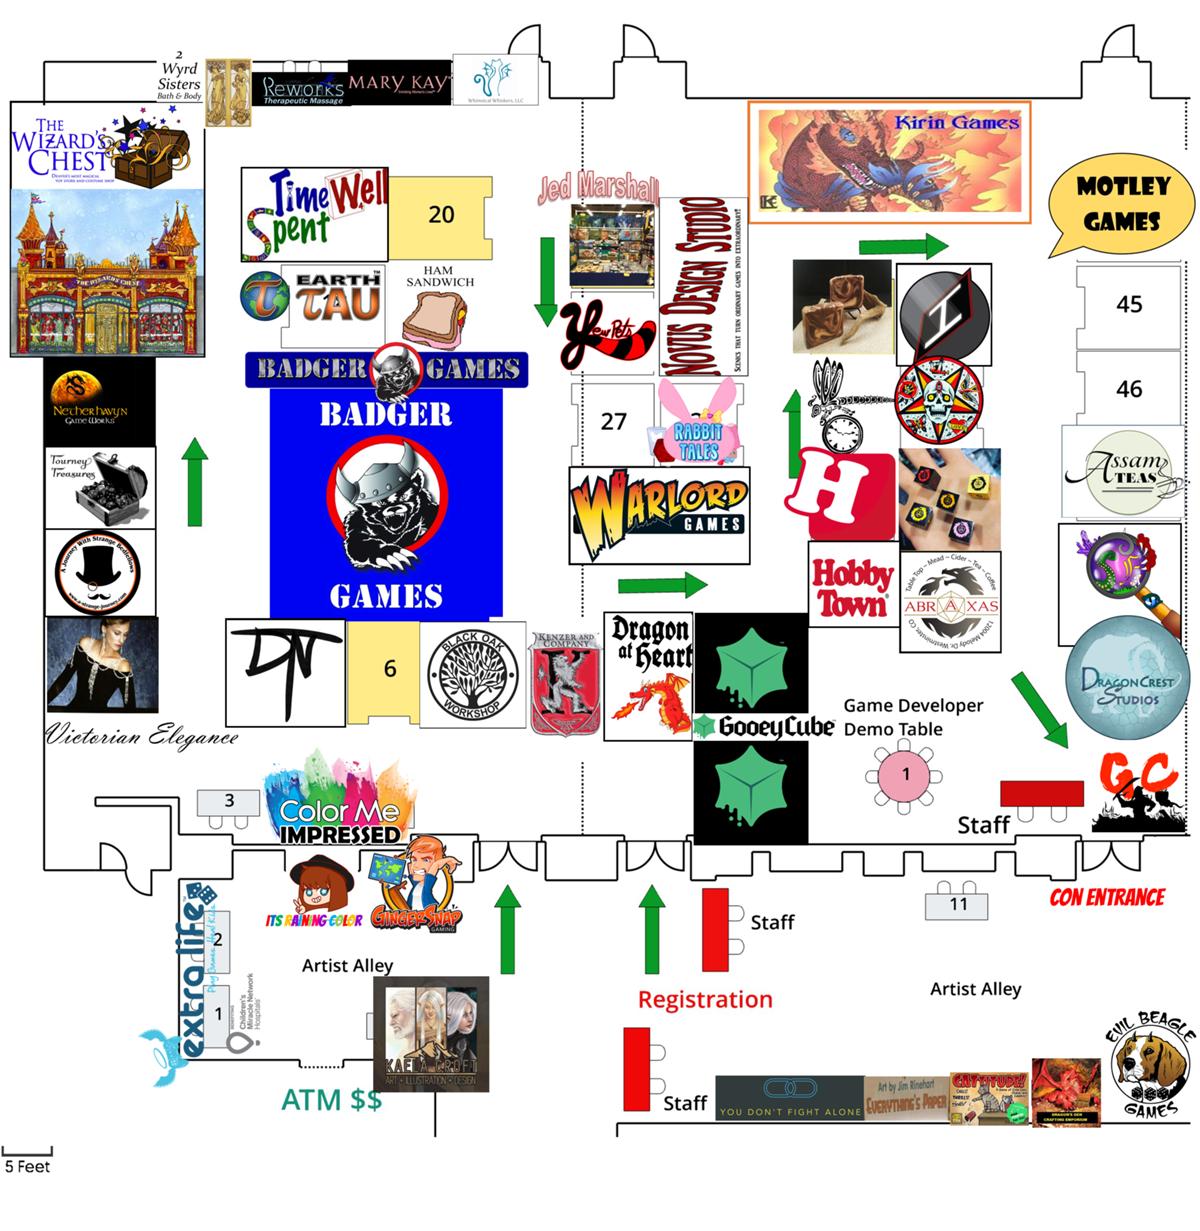 Exhibitor-Hall-Floor-Plan-1.png